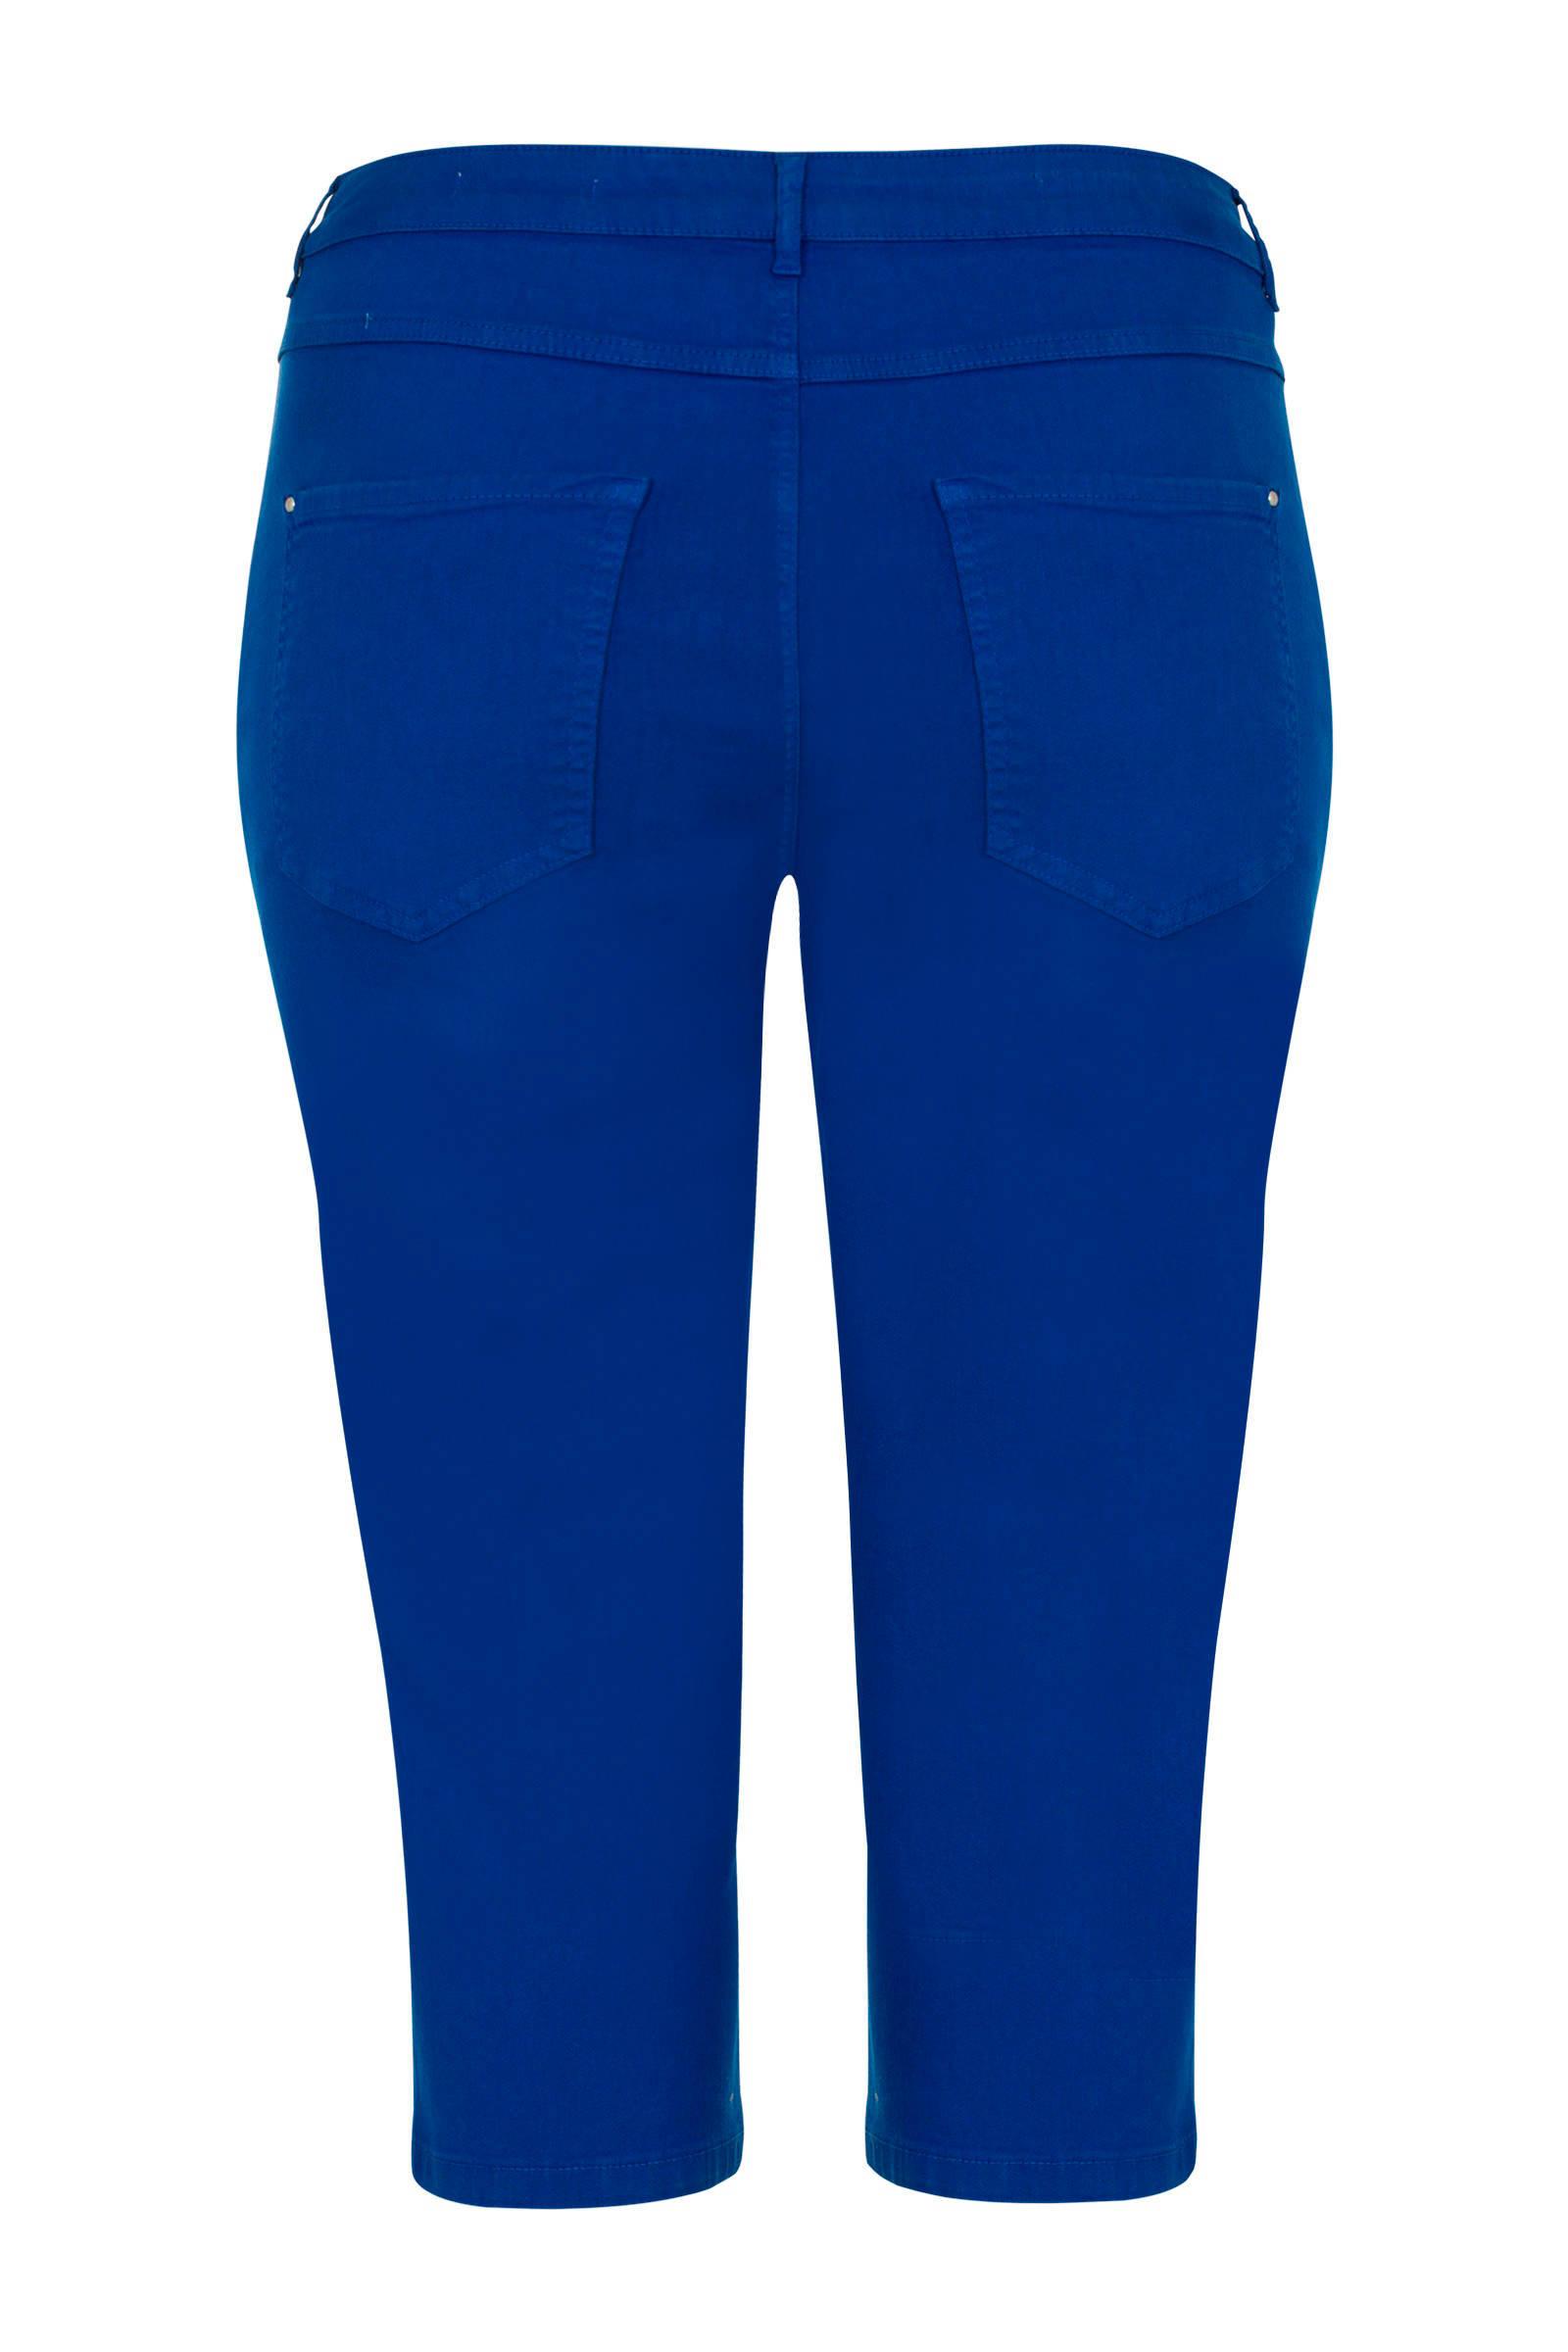 57e30403695 slim fit capri kobaltblauw